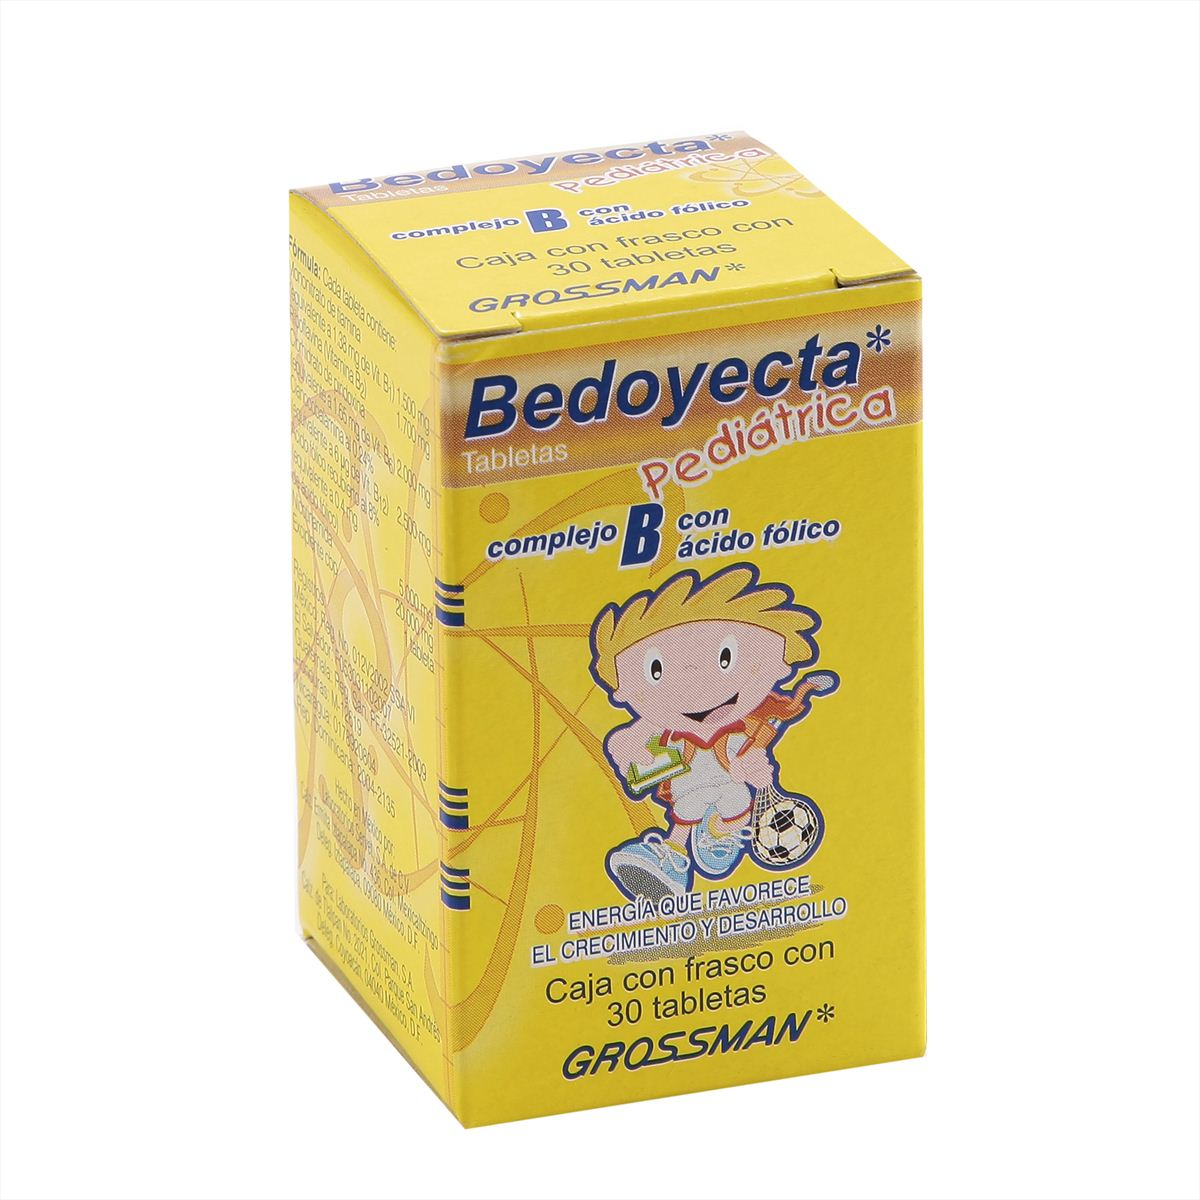 Bedoyecta pediádtrica 30 tabletas  - Sanborns